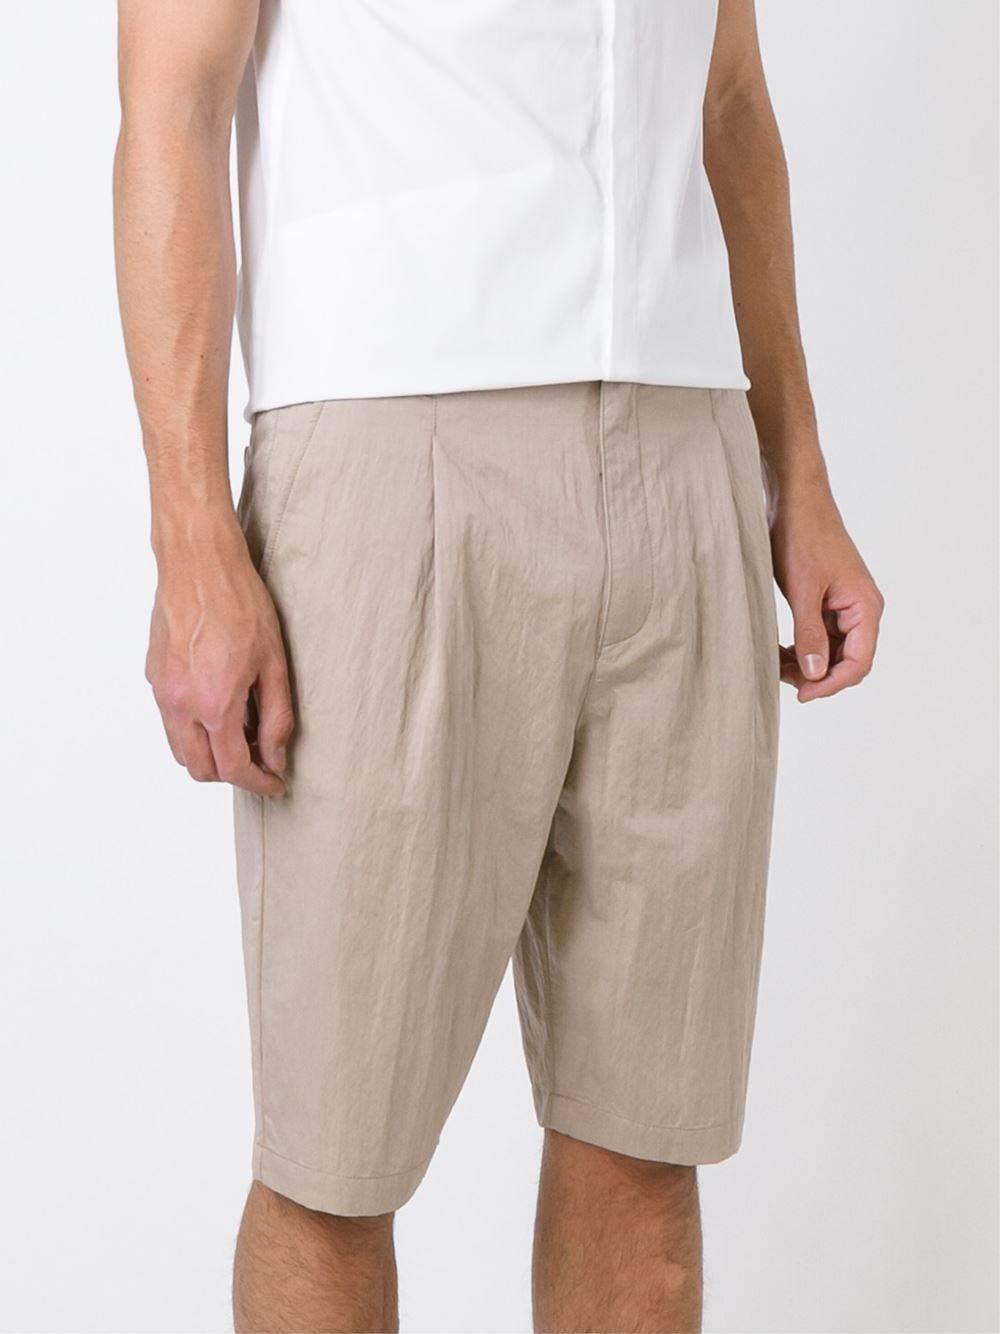 #helmutlang #shorts #pants #beige #summer #men #fashion www.jofre.eu